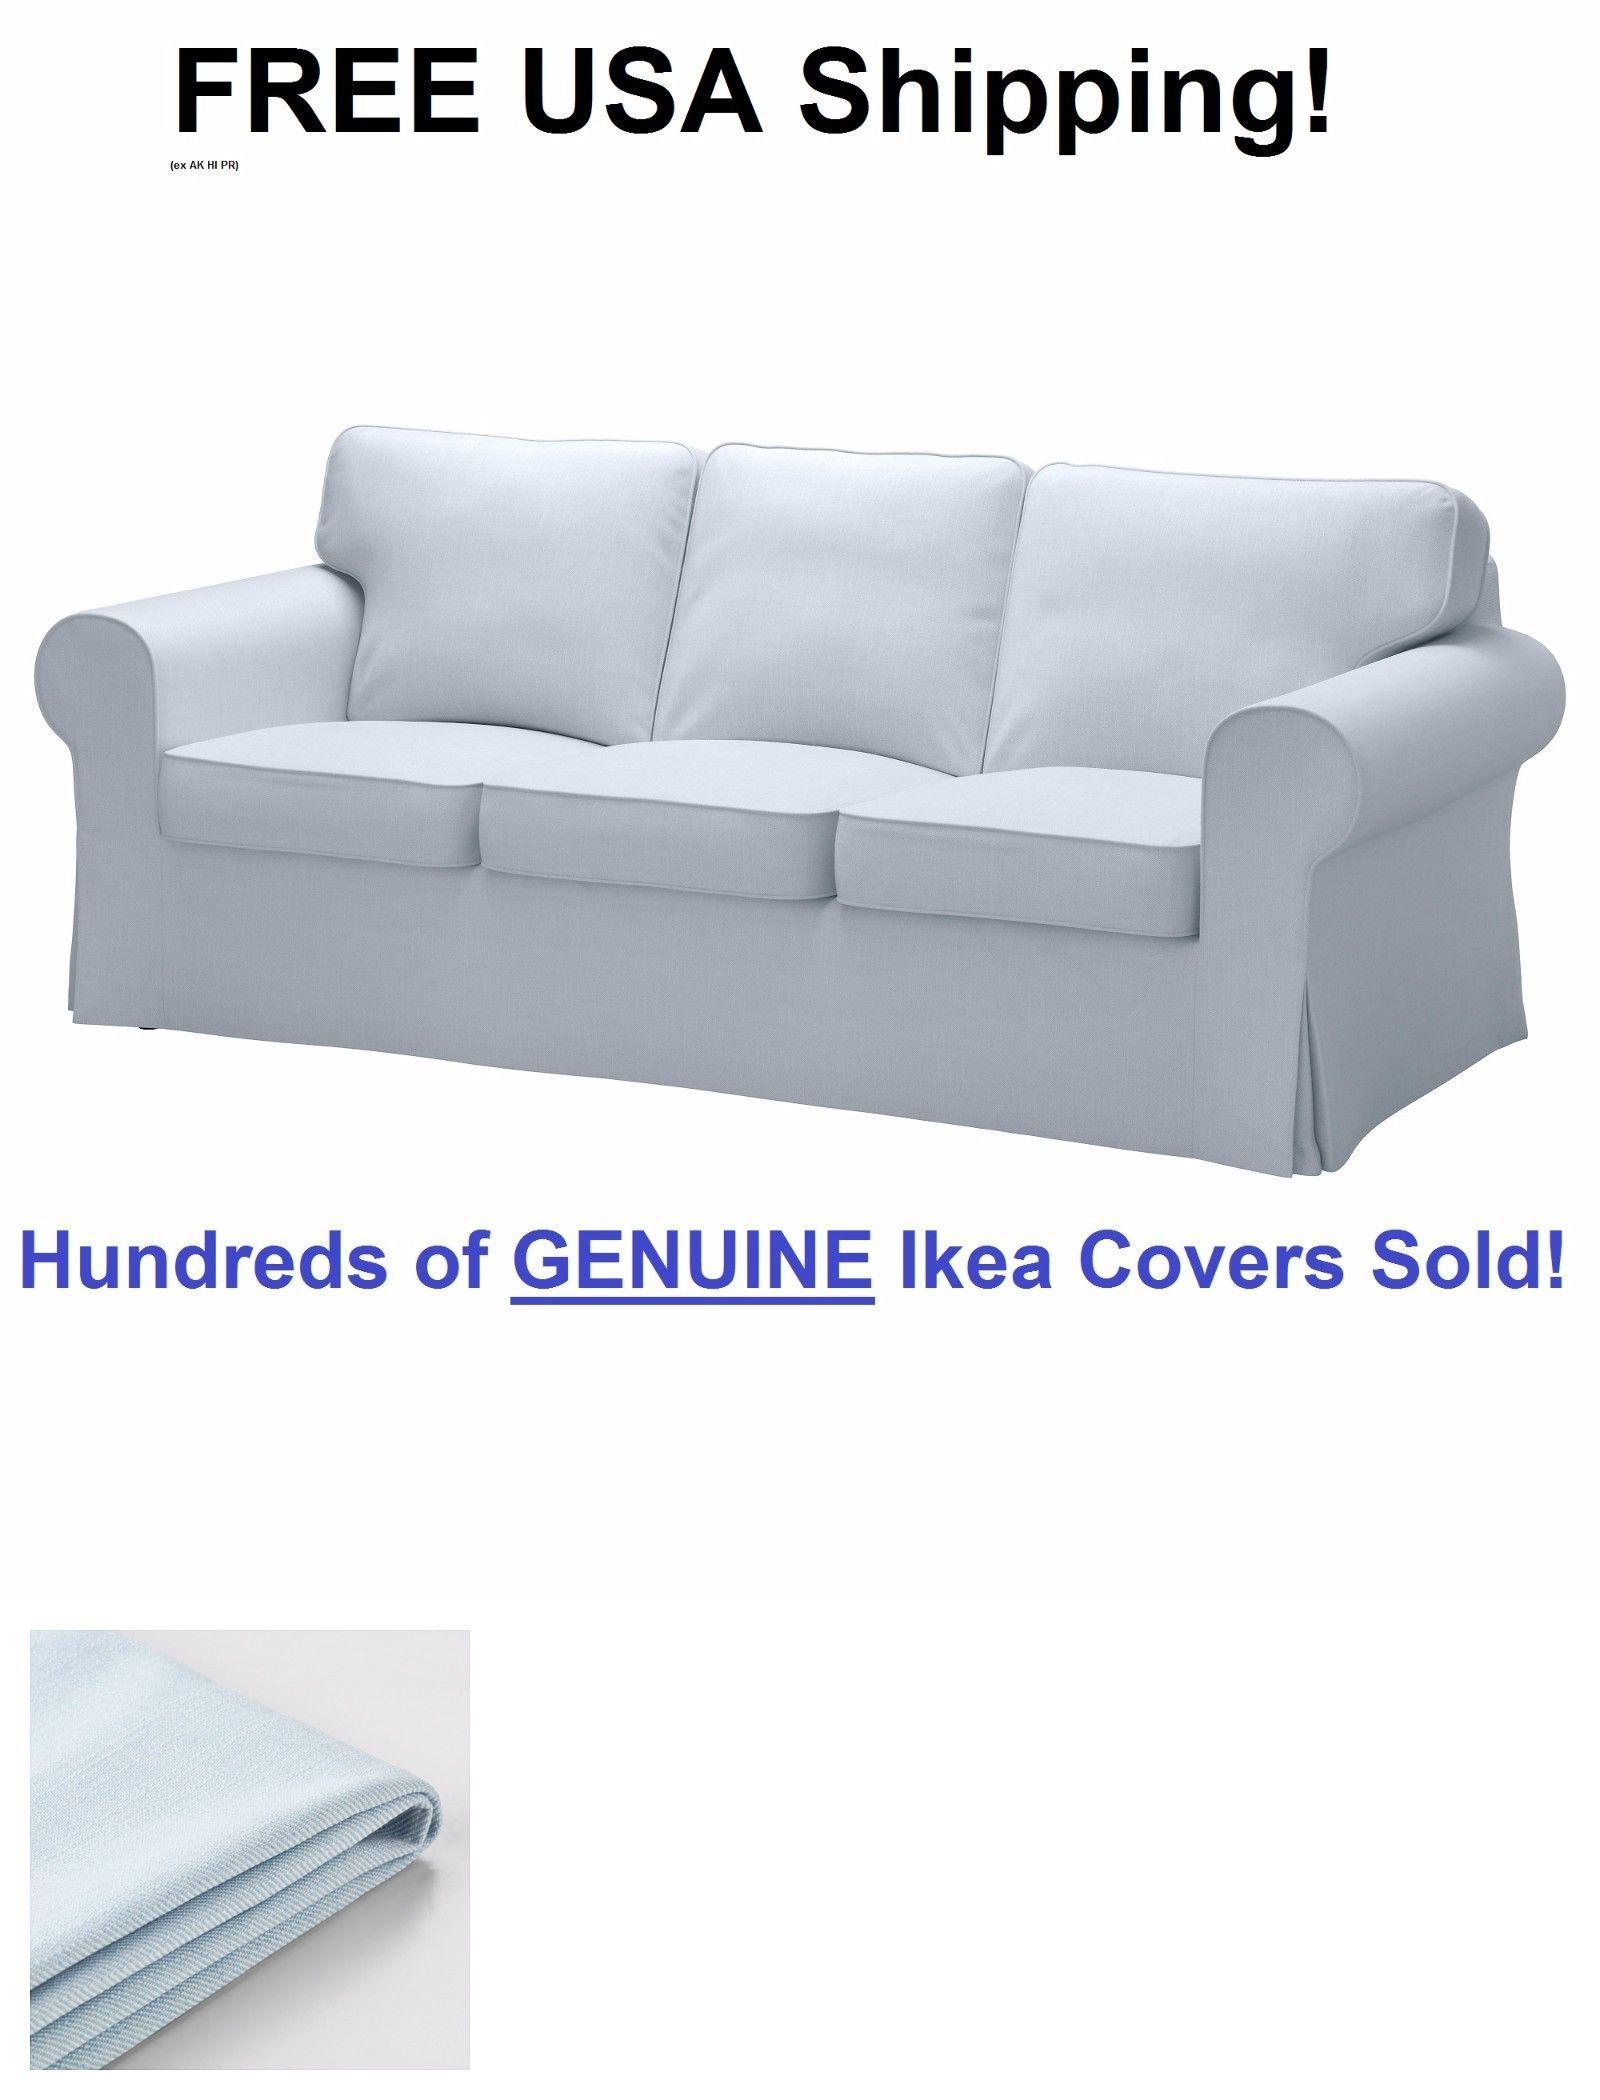 Slipcovers 175754: Ikea Ektorp Three (3) Seat Sofa Slipcover Cover  Nordvalla Light Blue